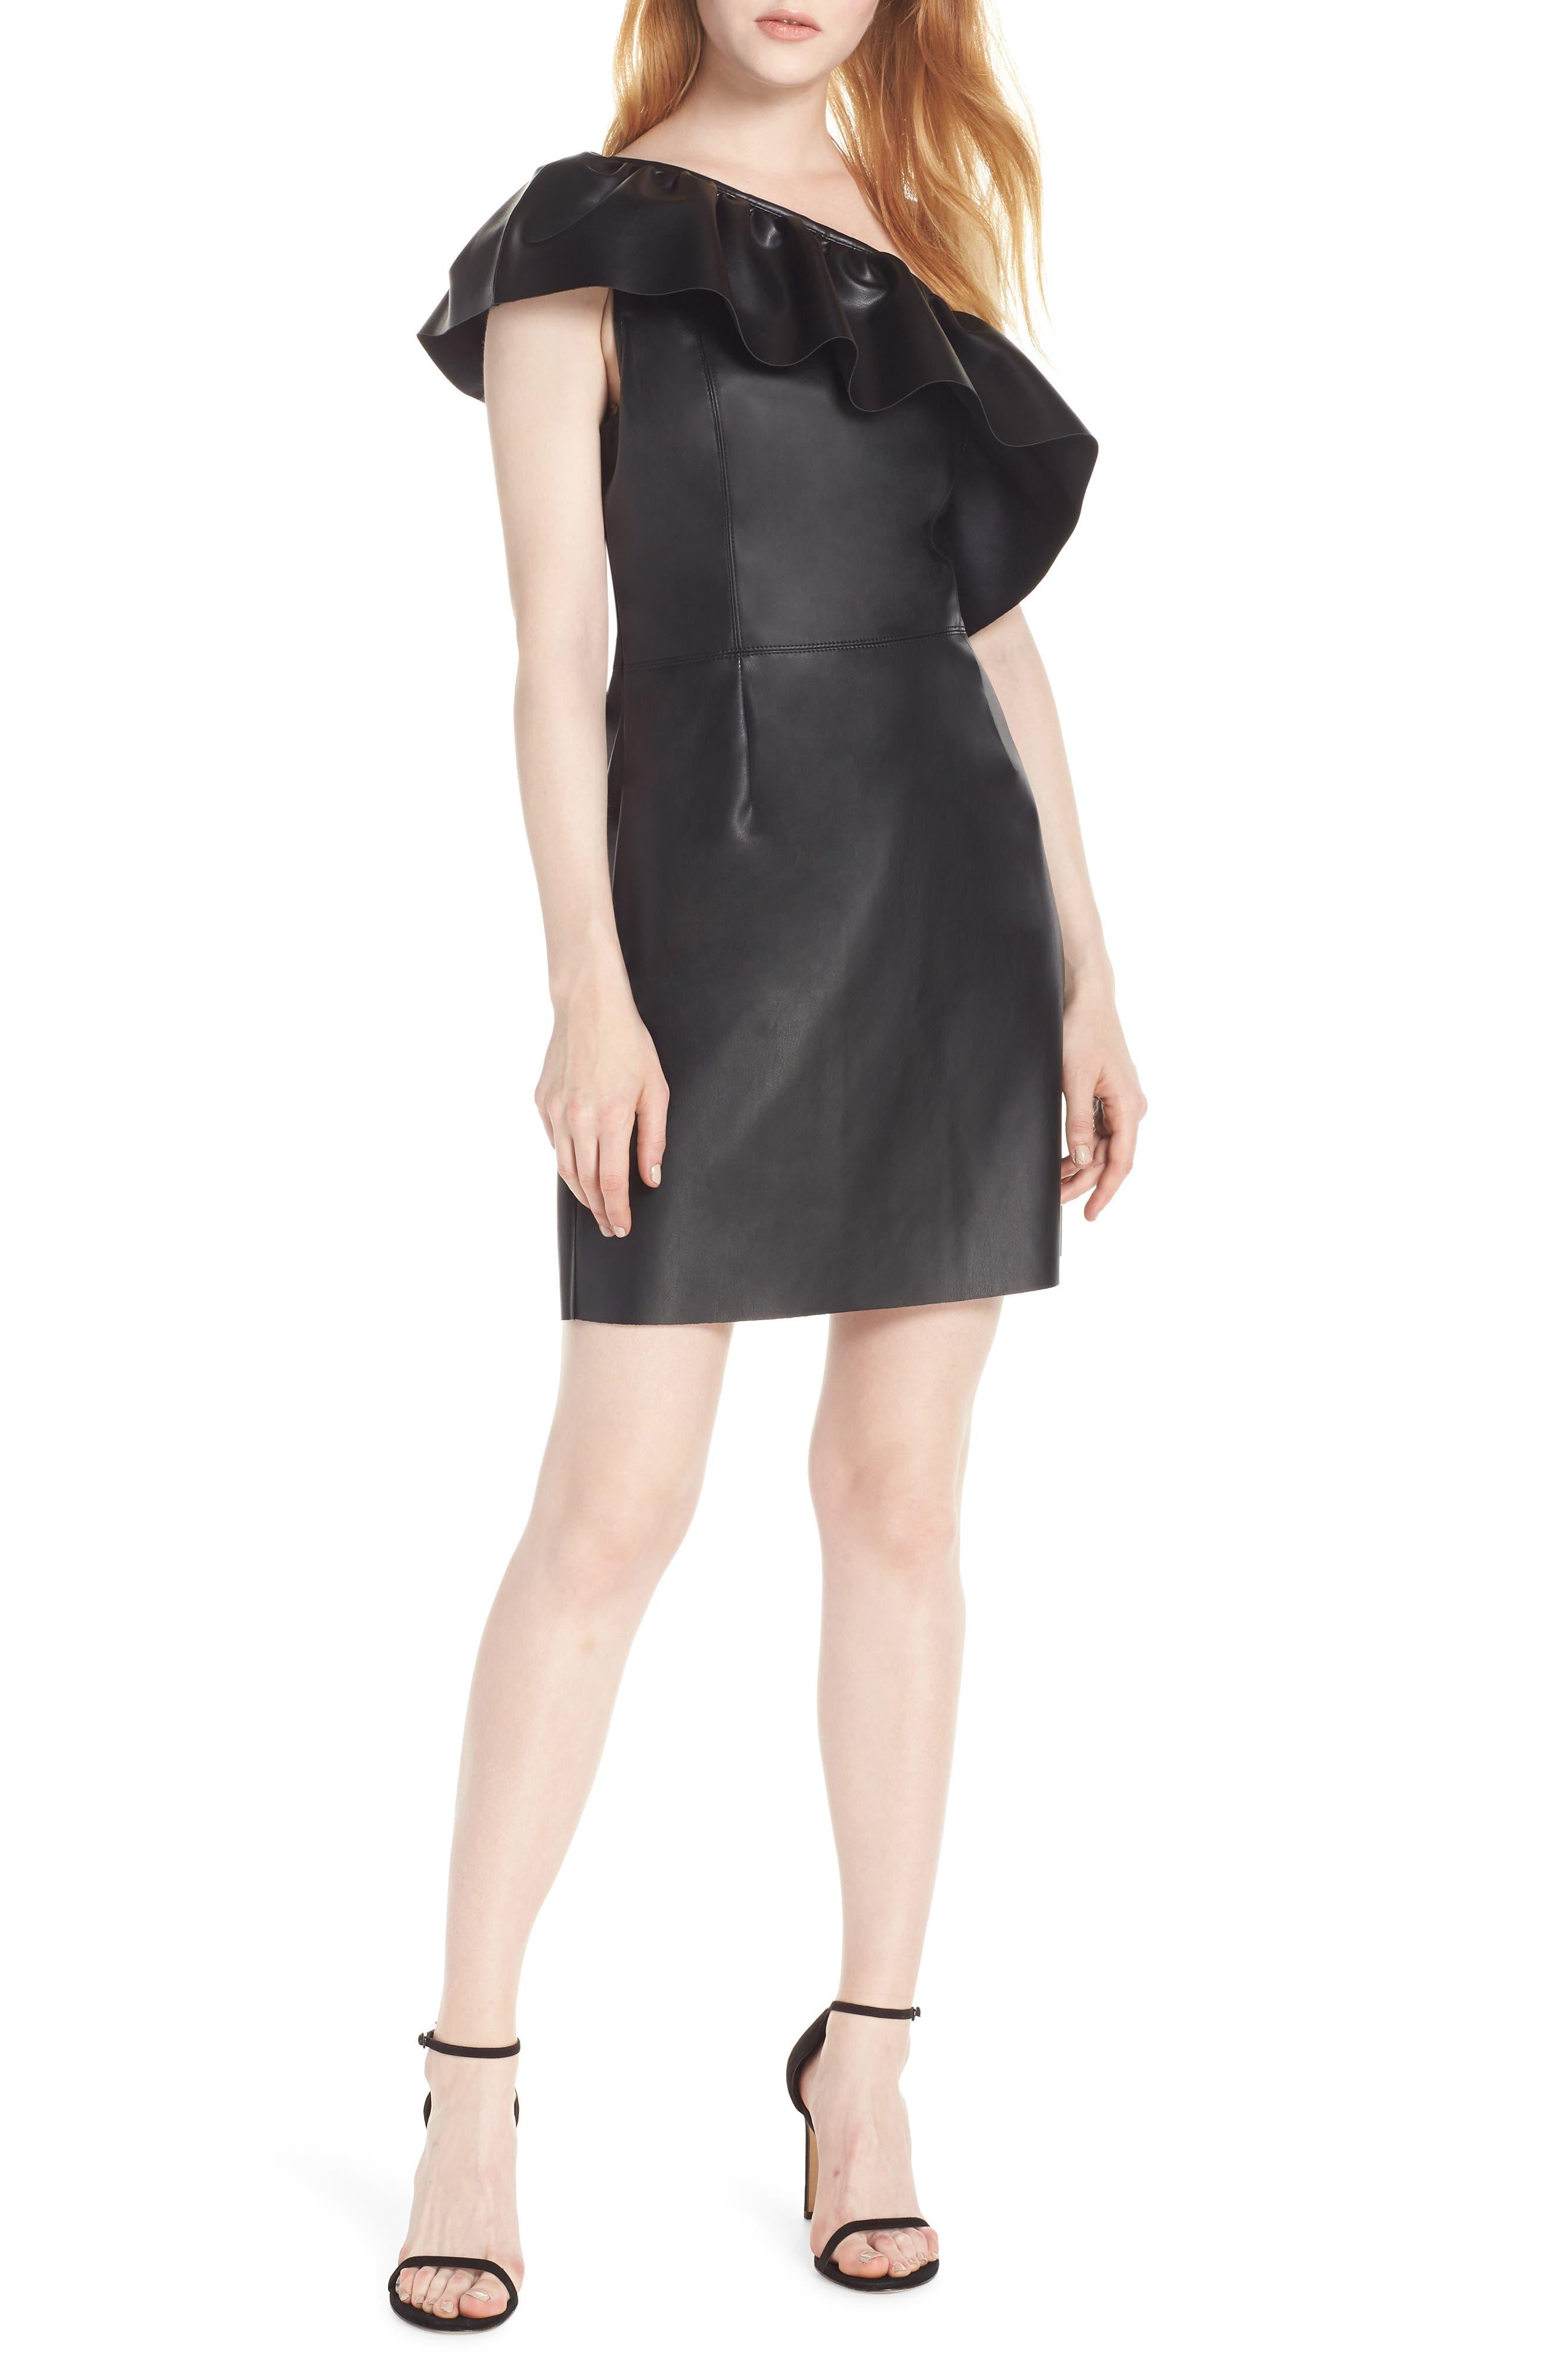 Bb Dakota One-Shoulder Faux Leather Dress, Black